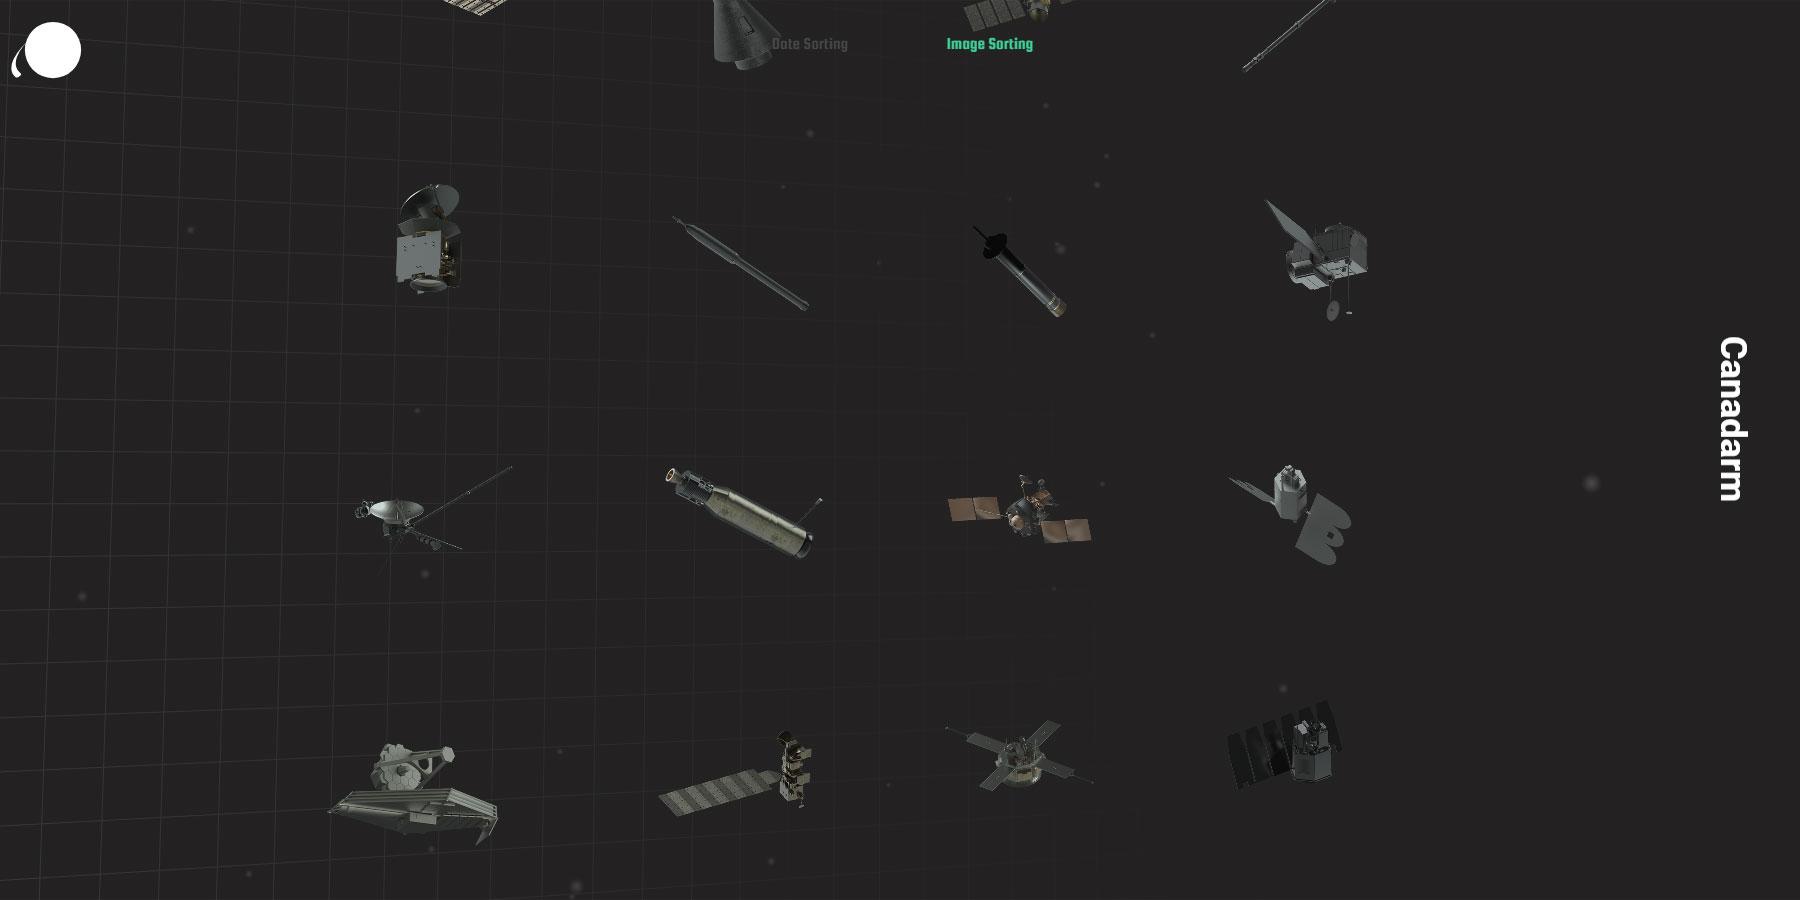 NASA SPACECRAFT - Website of the Day